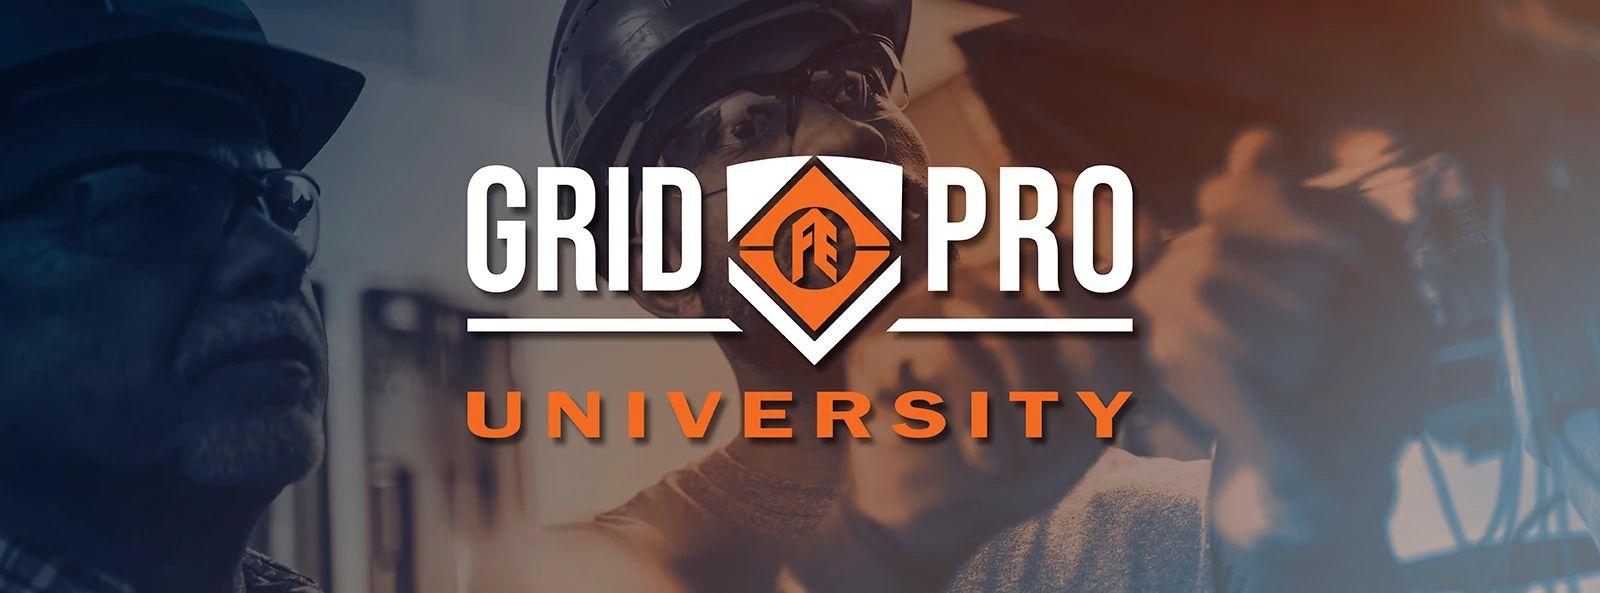 Grid - Home - University Banner.png